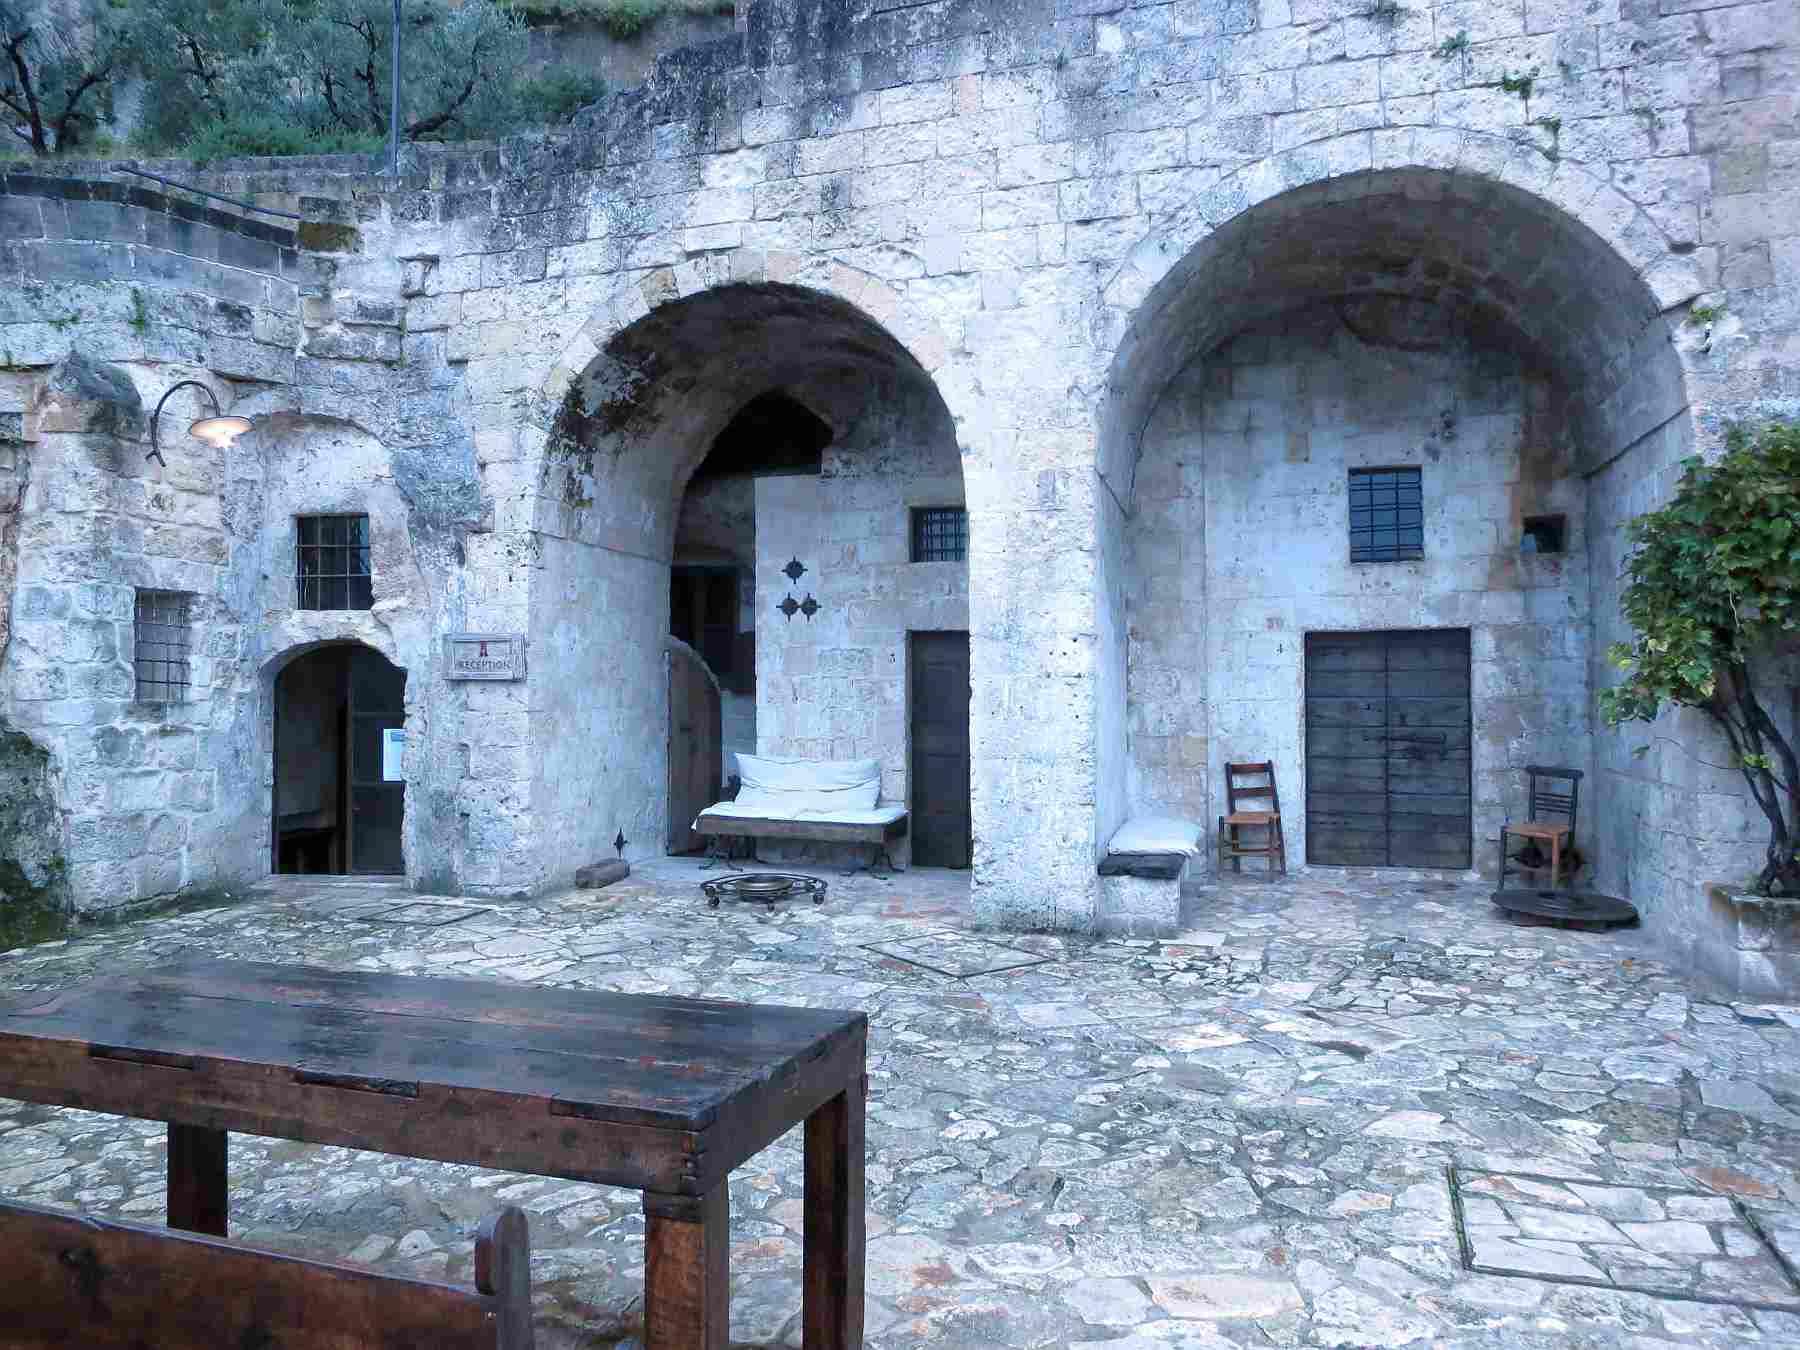 Cave Hotel Entrance Photo